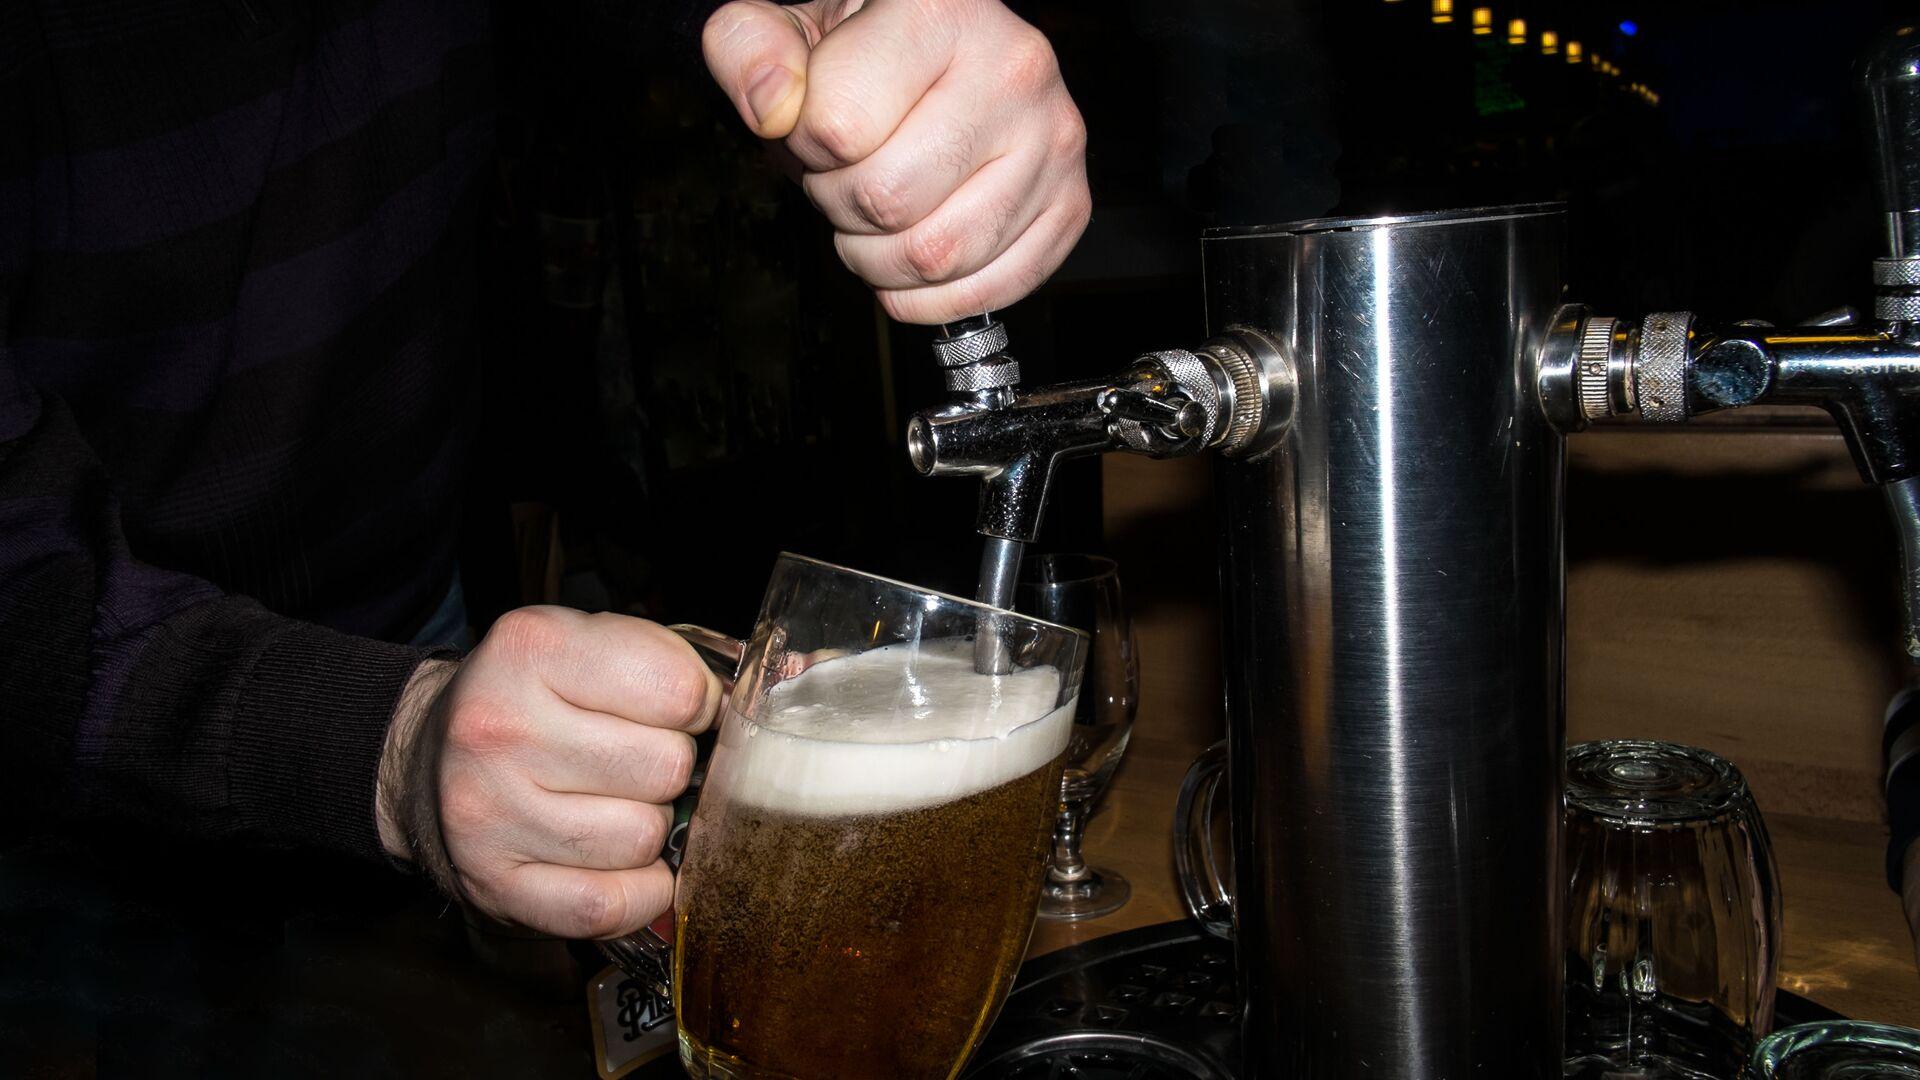 Barman nalewa piwo - Sputnik Polska, 1920, 08.08.2021